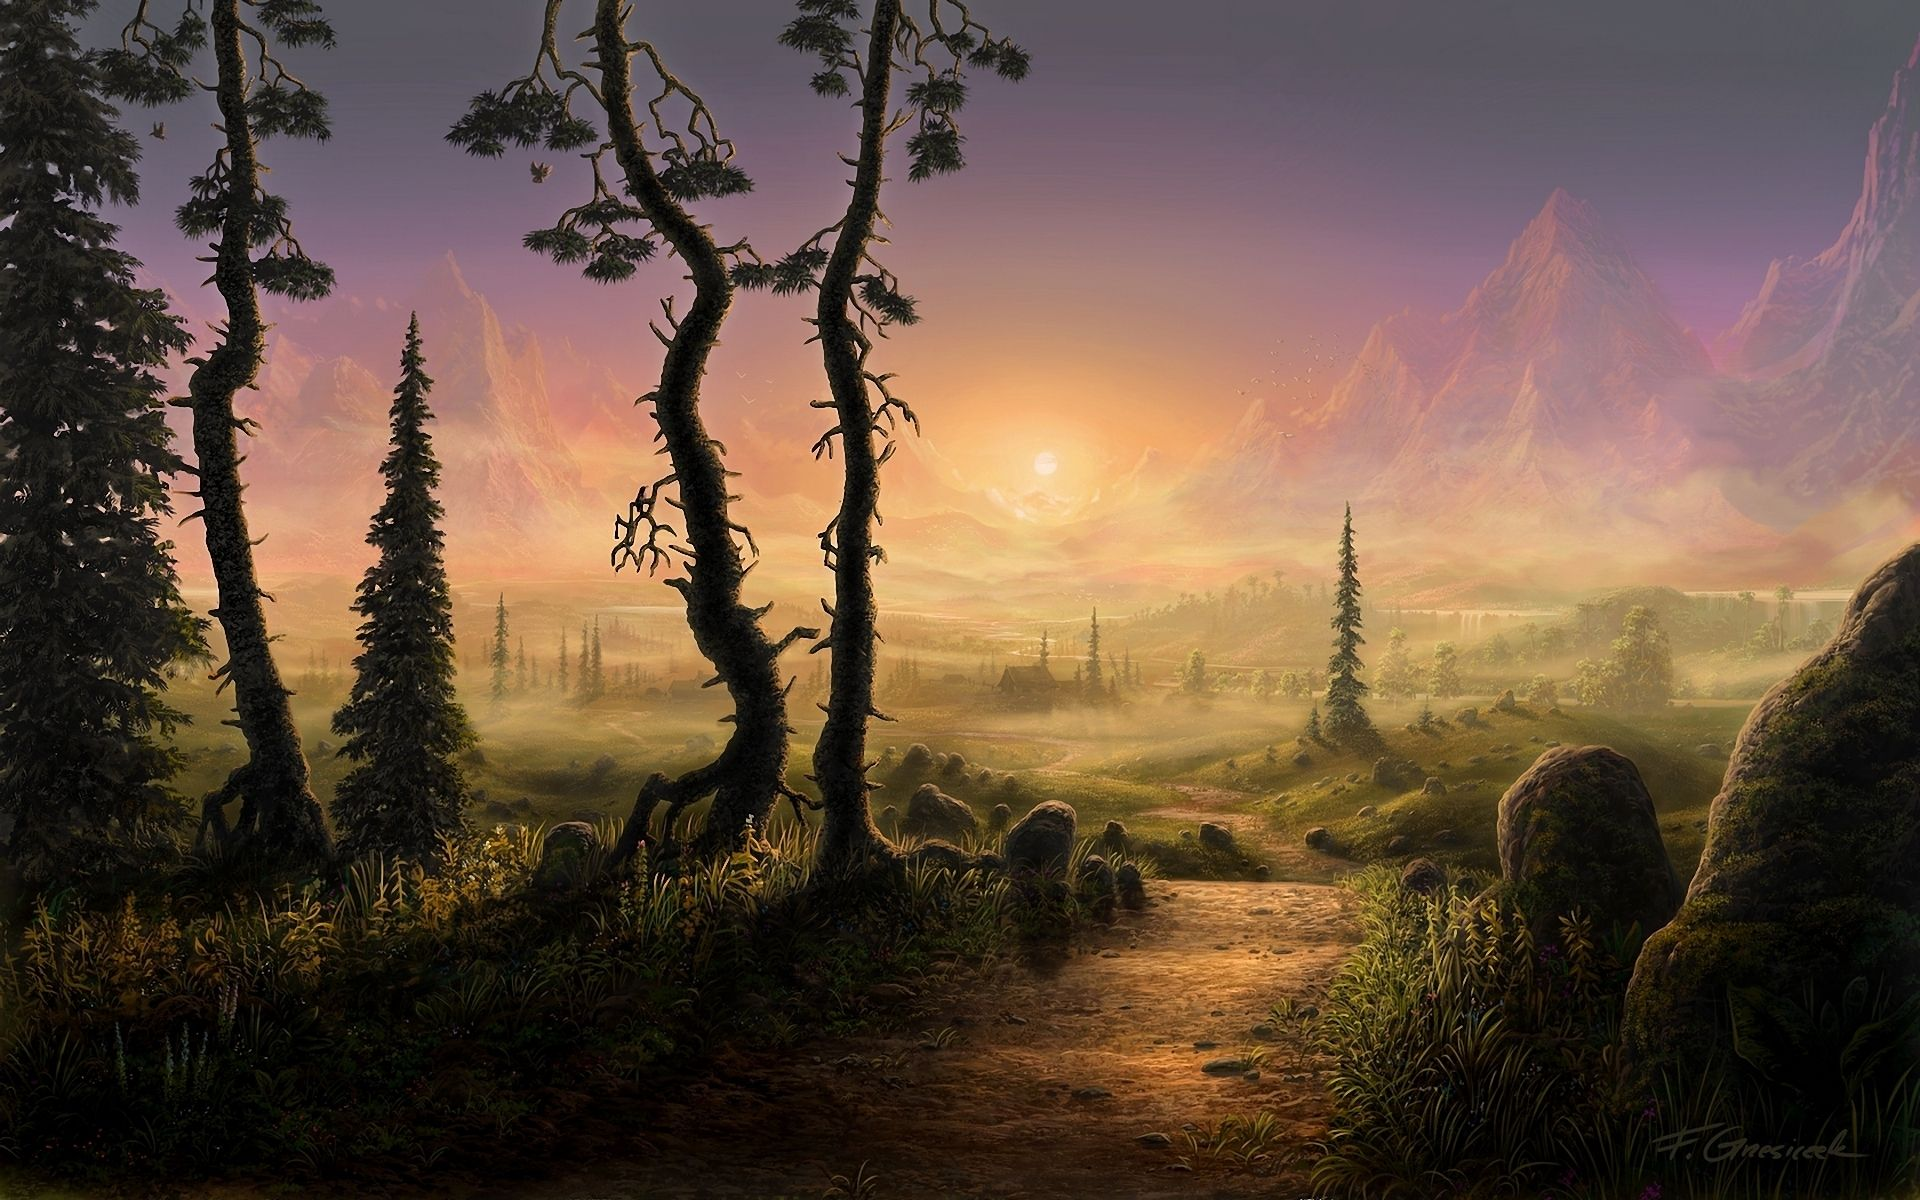 fantasy - landscape - fantasy - artistic - 4k - ultrahd - hd